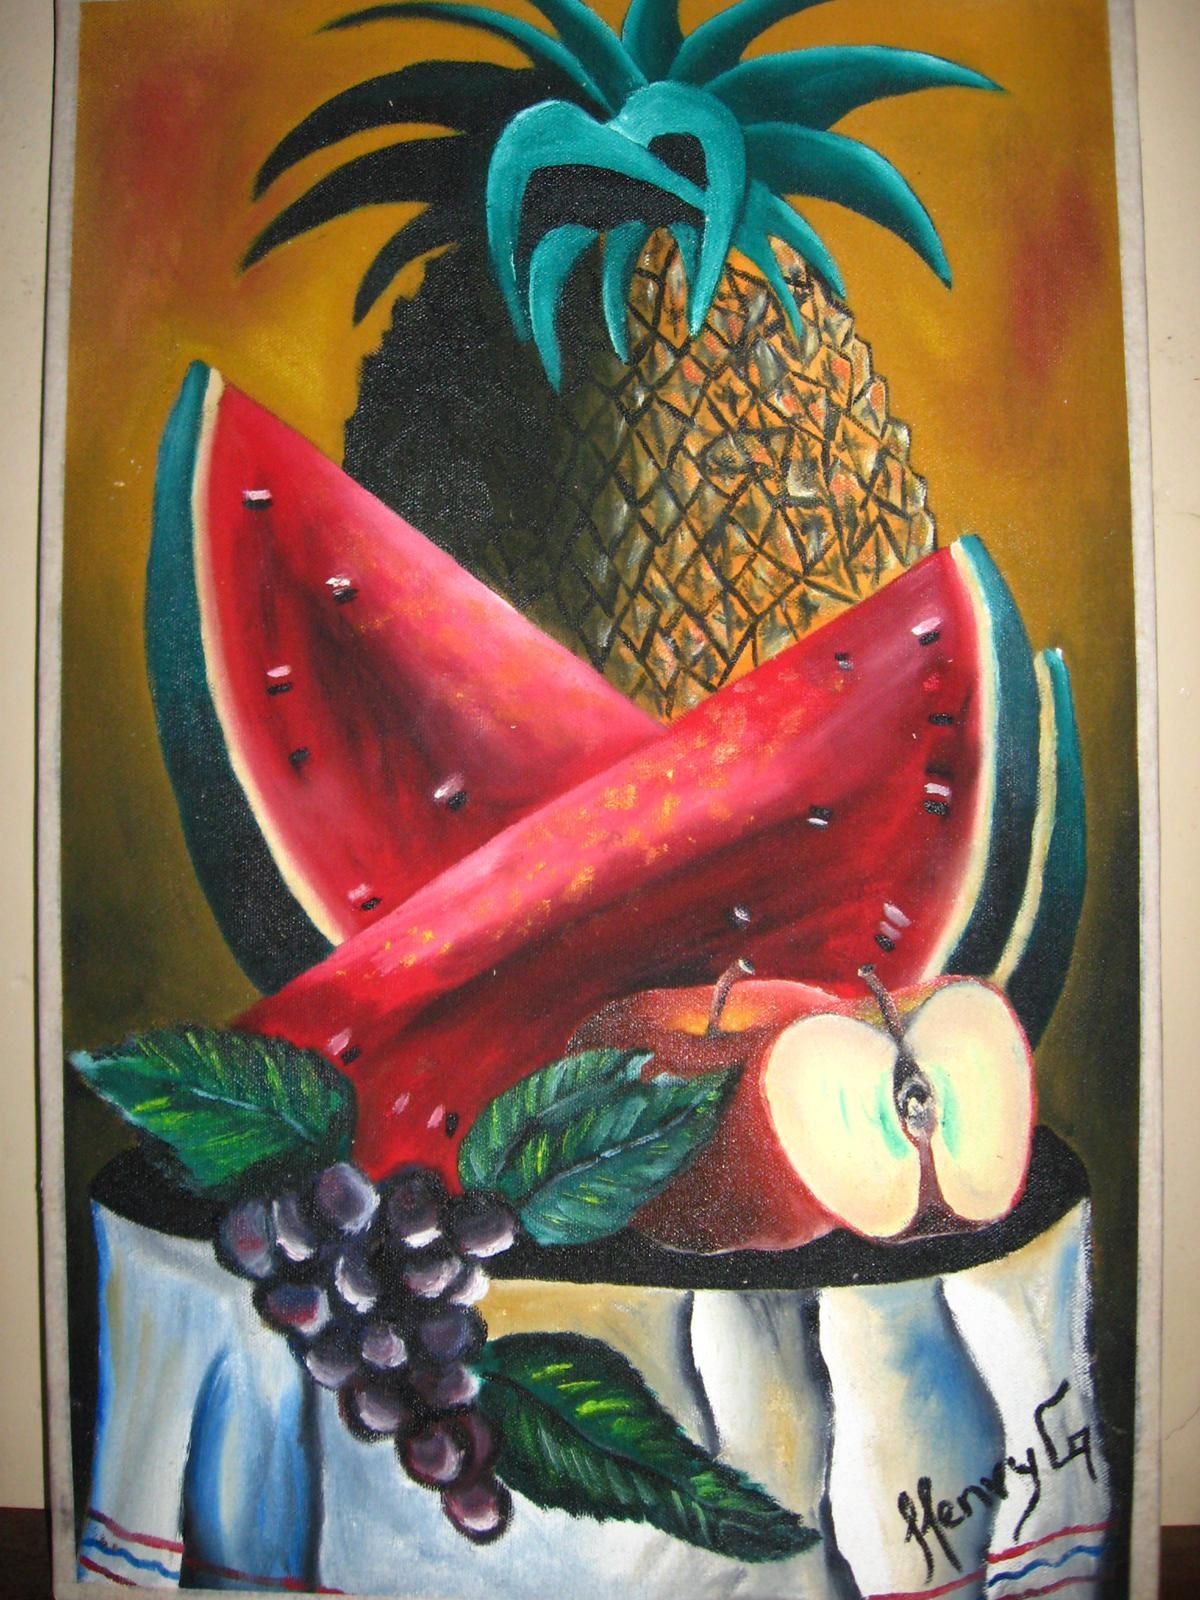 pinturas: abril 2012 | cuadros frutales | Pinterest | Pinturas ...